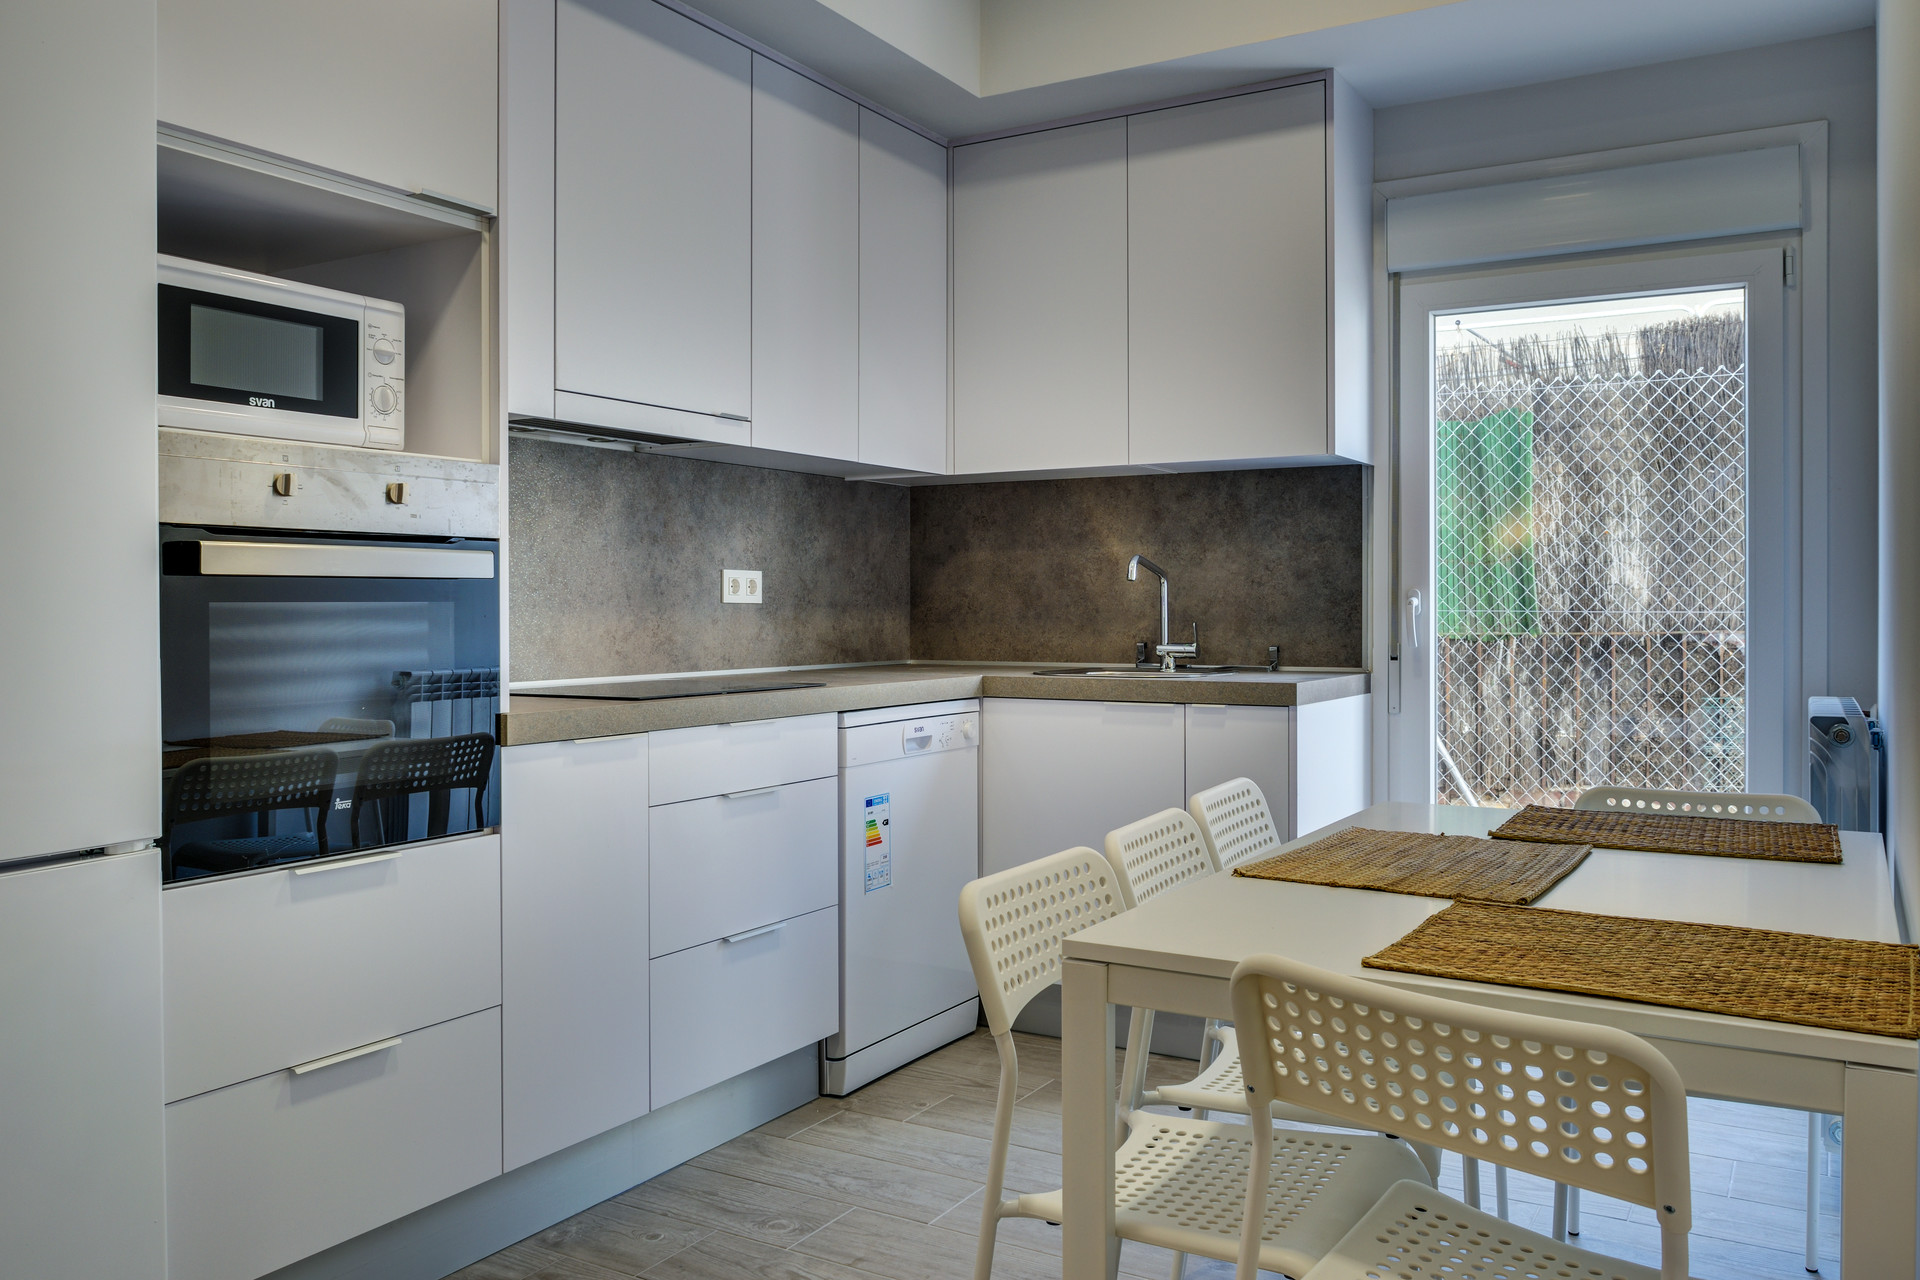 cocina luminosa renovada alquilar piso compartido zaragoza